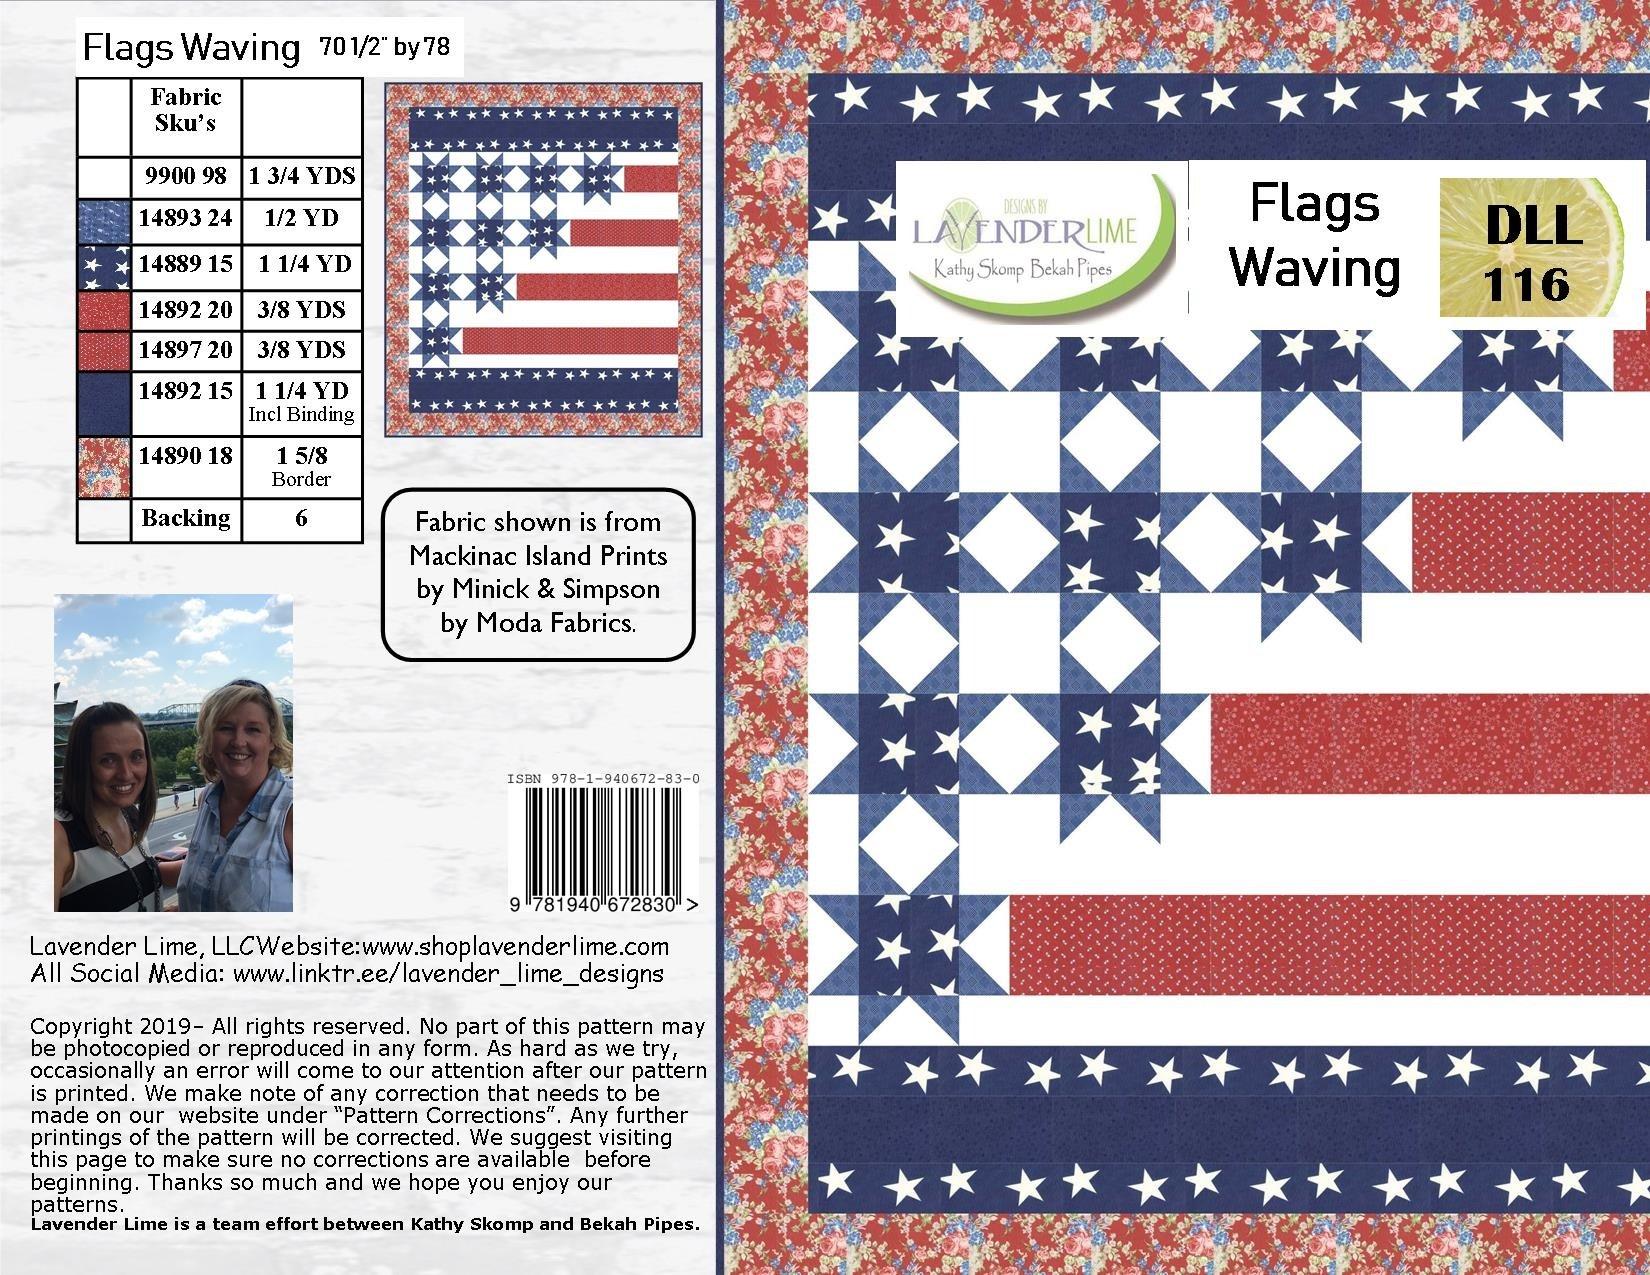 Flags Waving